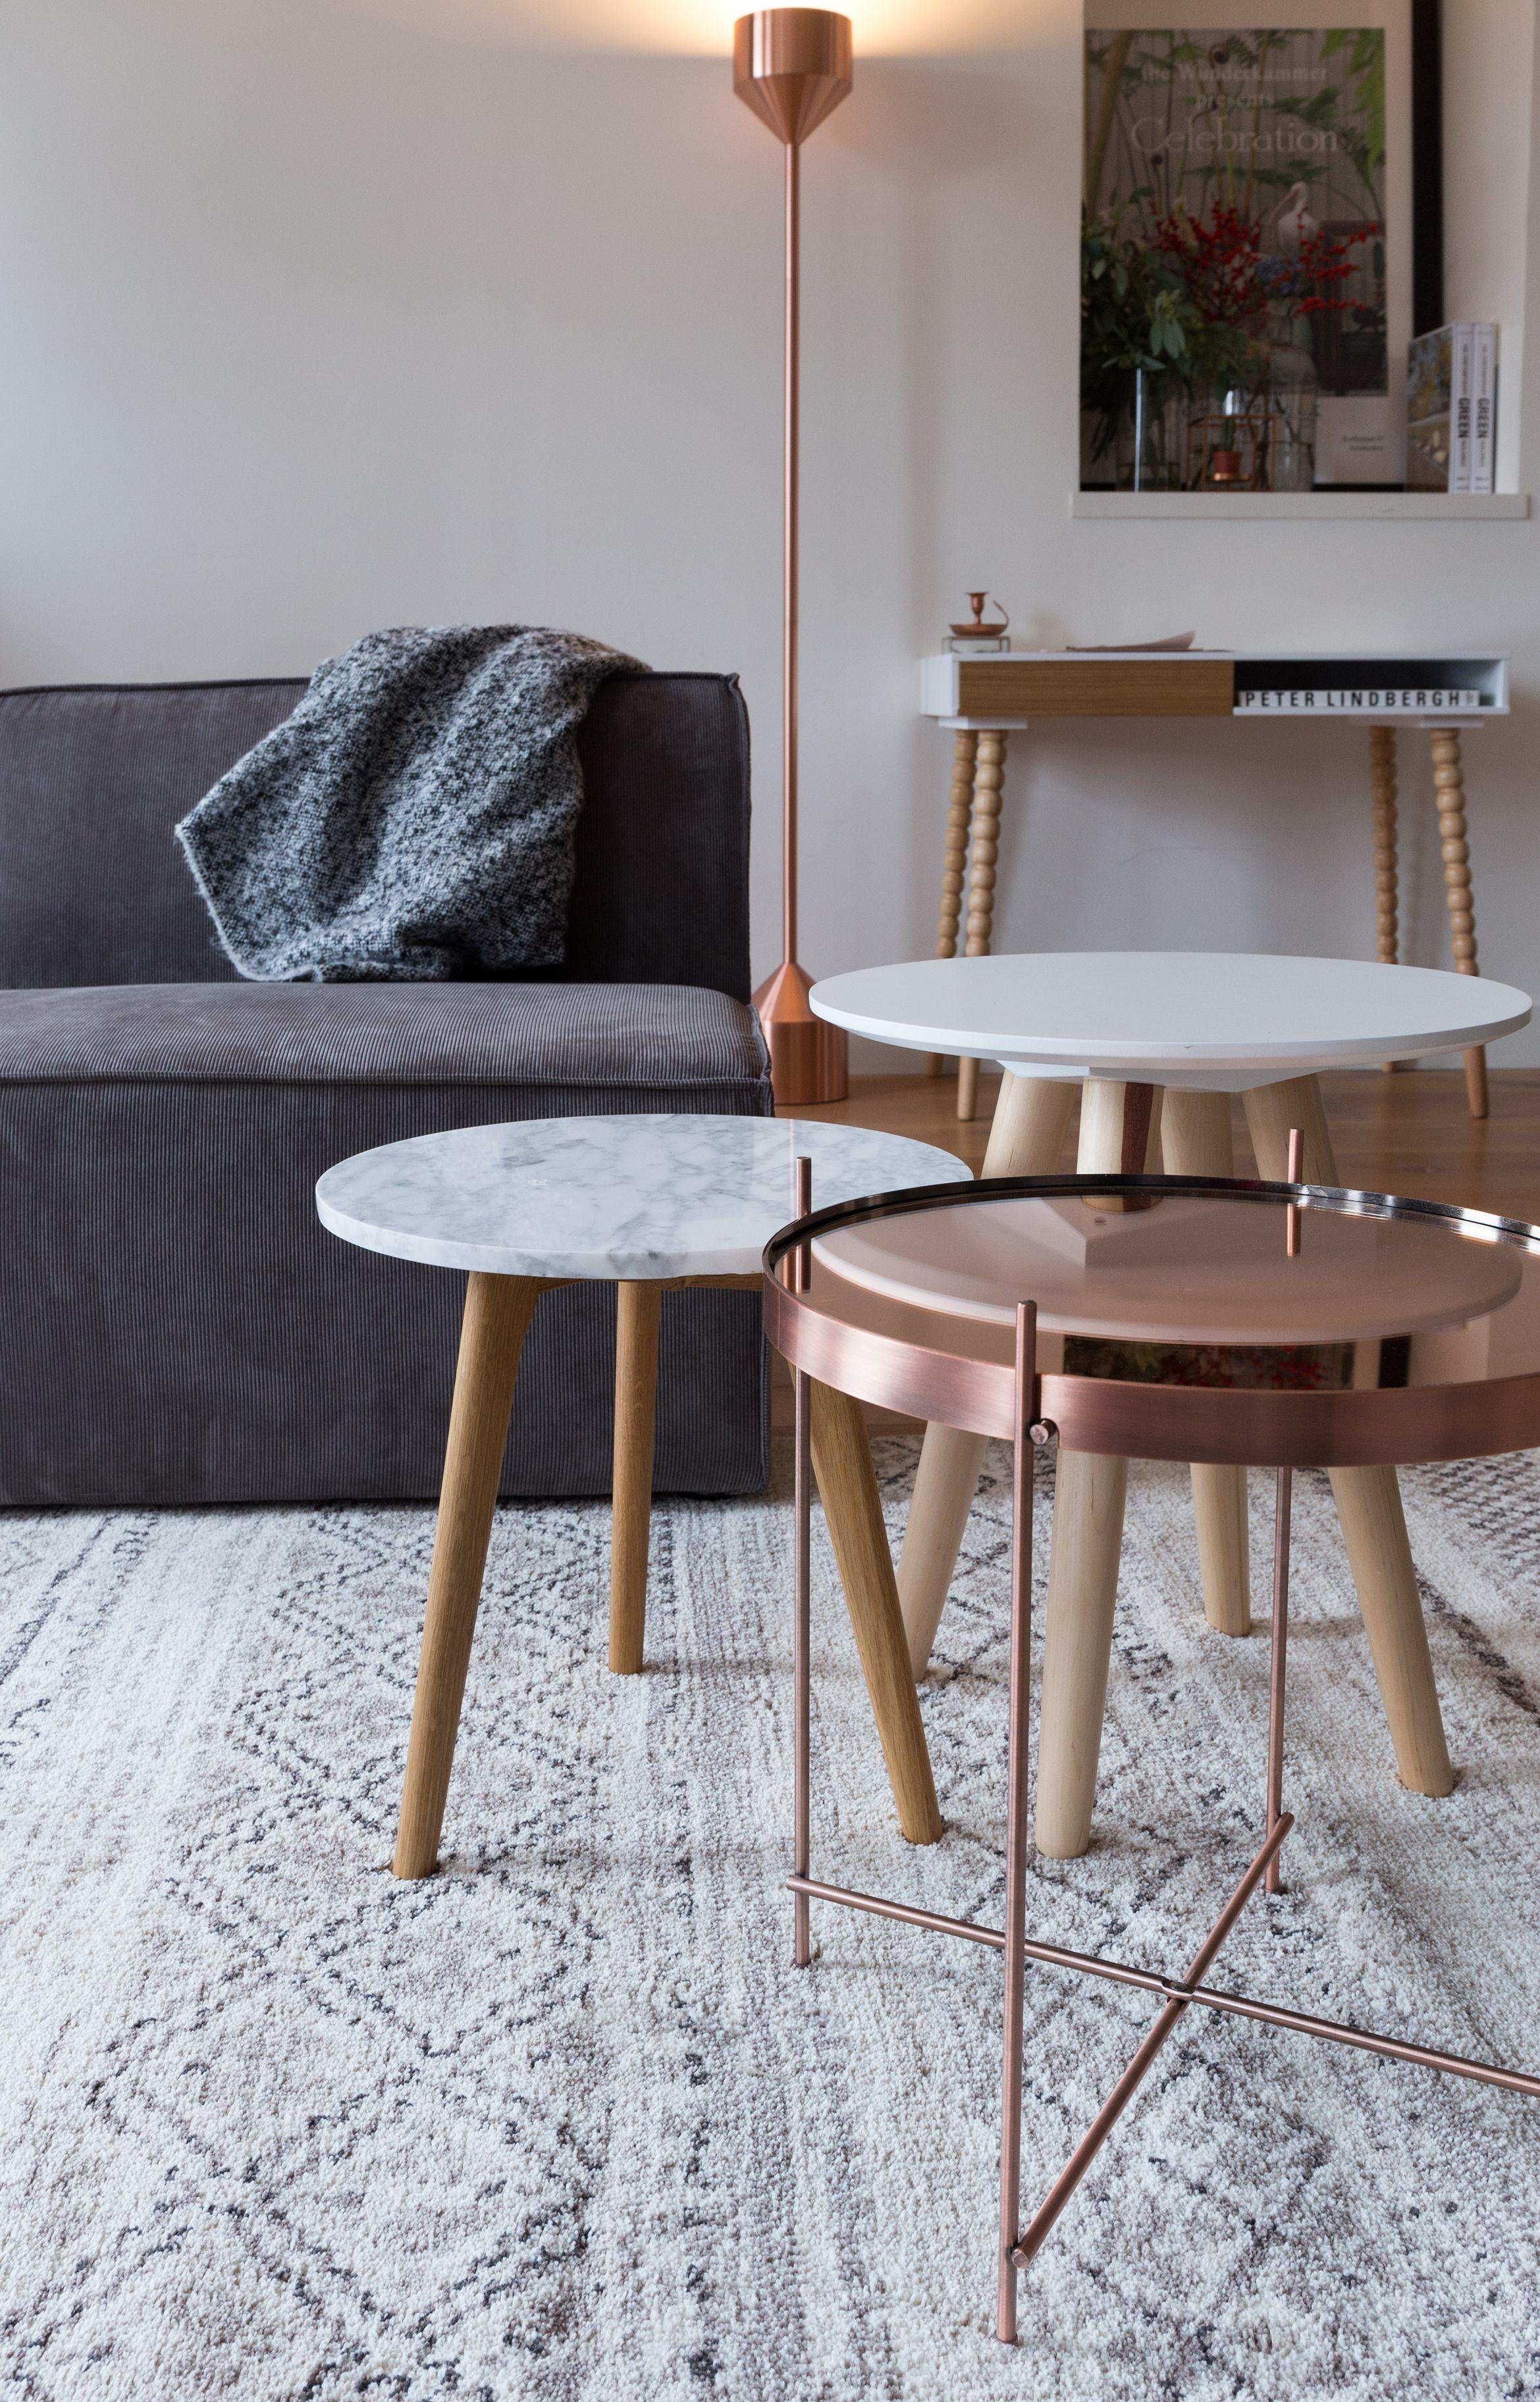 Torch floor lamp Zuiver | Interior, Coffee table, Decor